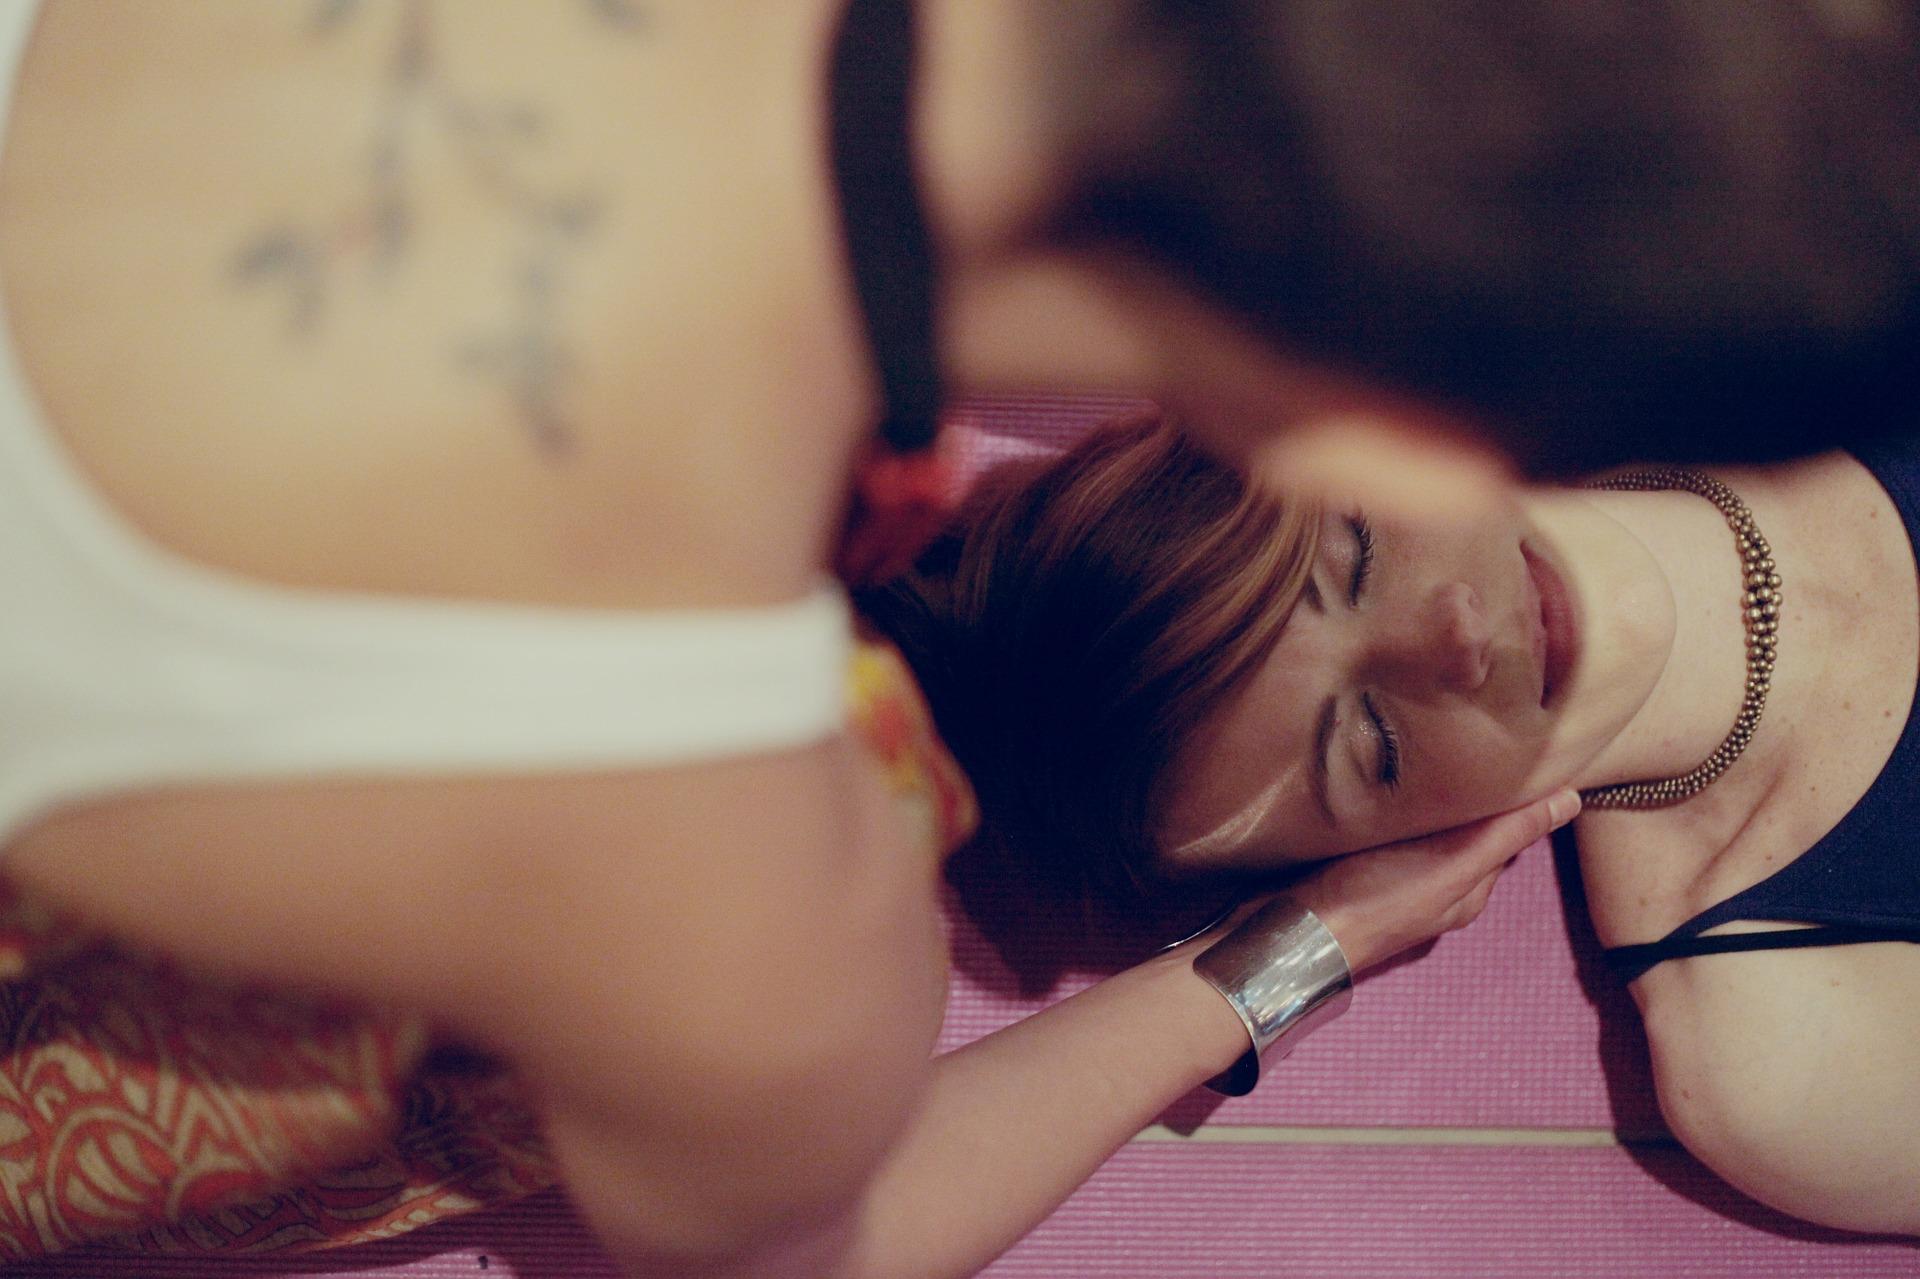 massage-835468_1920.jpg